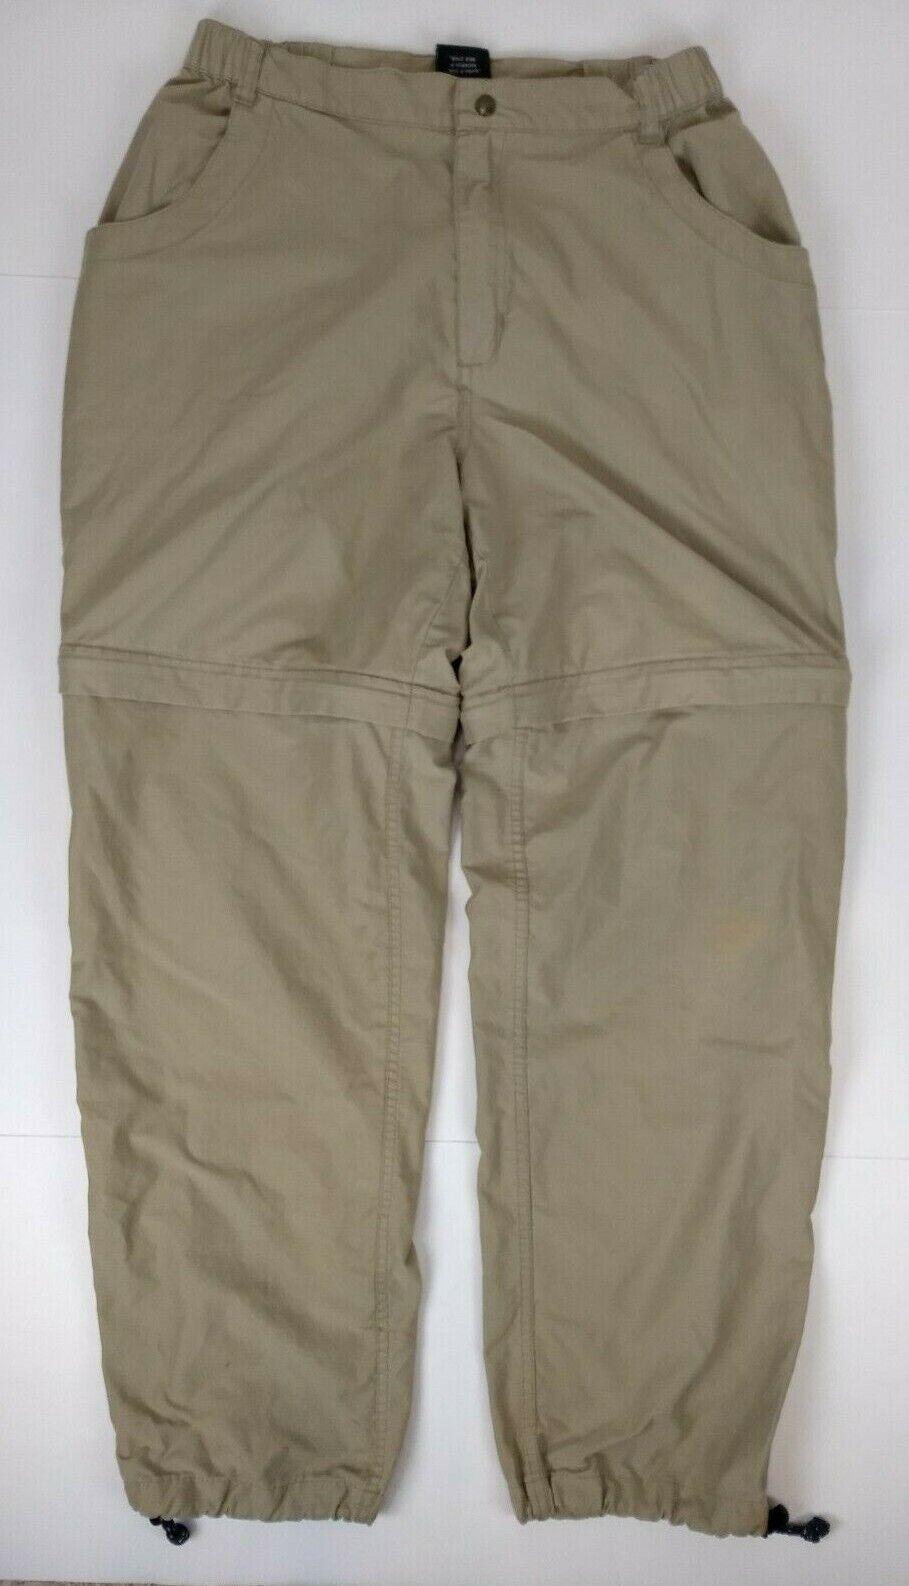 Vintage Kuhl Alf Kuhldry Congreenible Cargo Pants Shorts Mens Size L Khaki Hiking